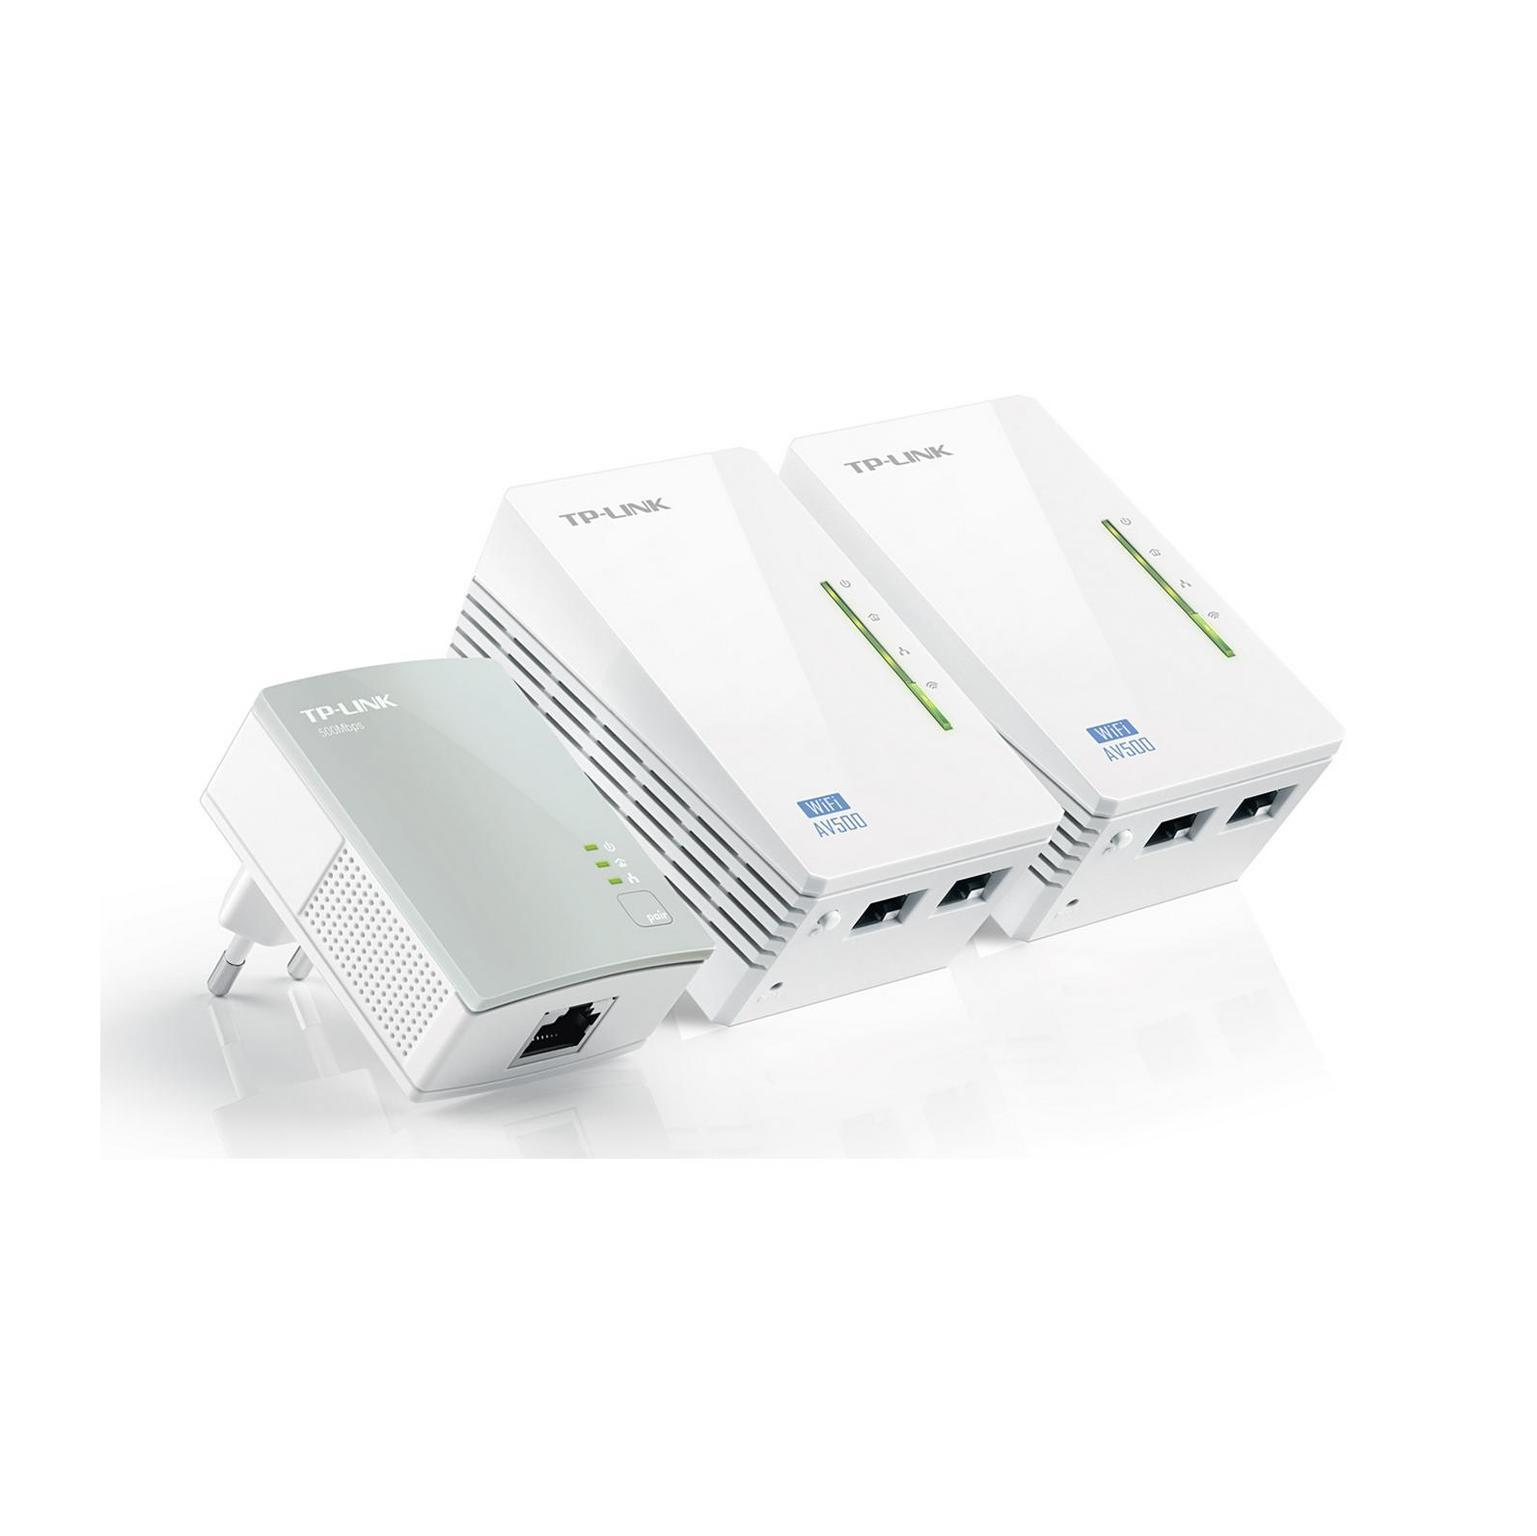 TP-Link TL-WPA4220T wifi versterker kit